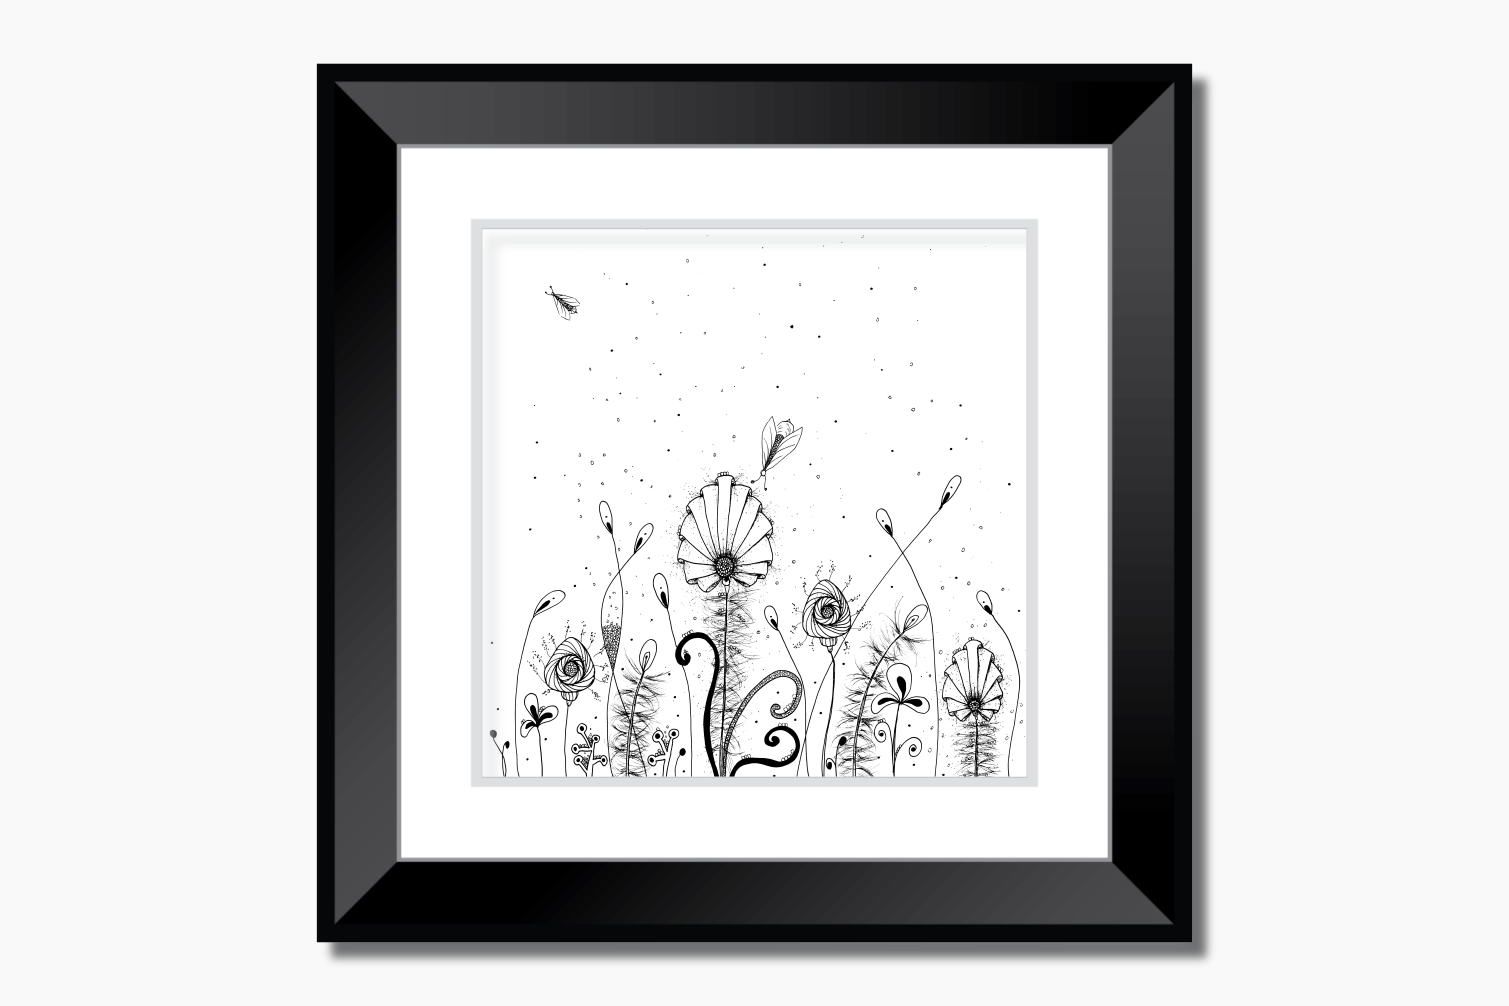 Floral Doodle Art, A1, SVG example image 6